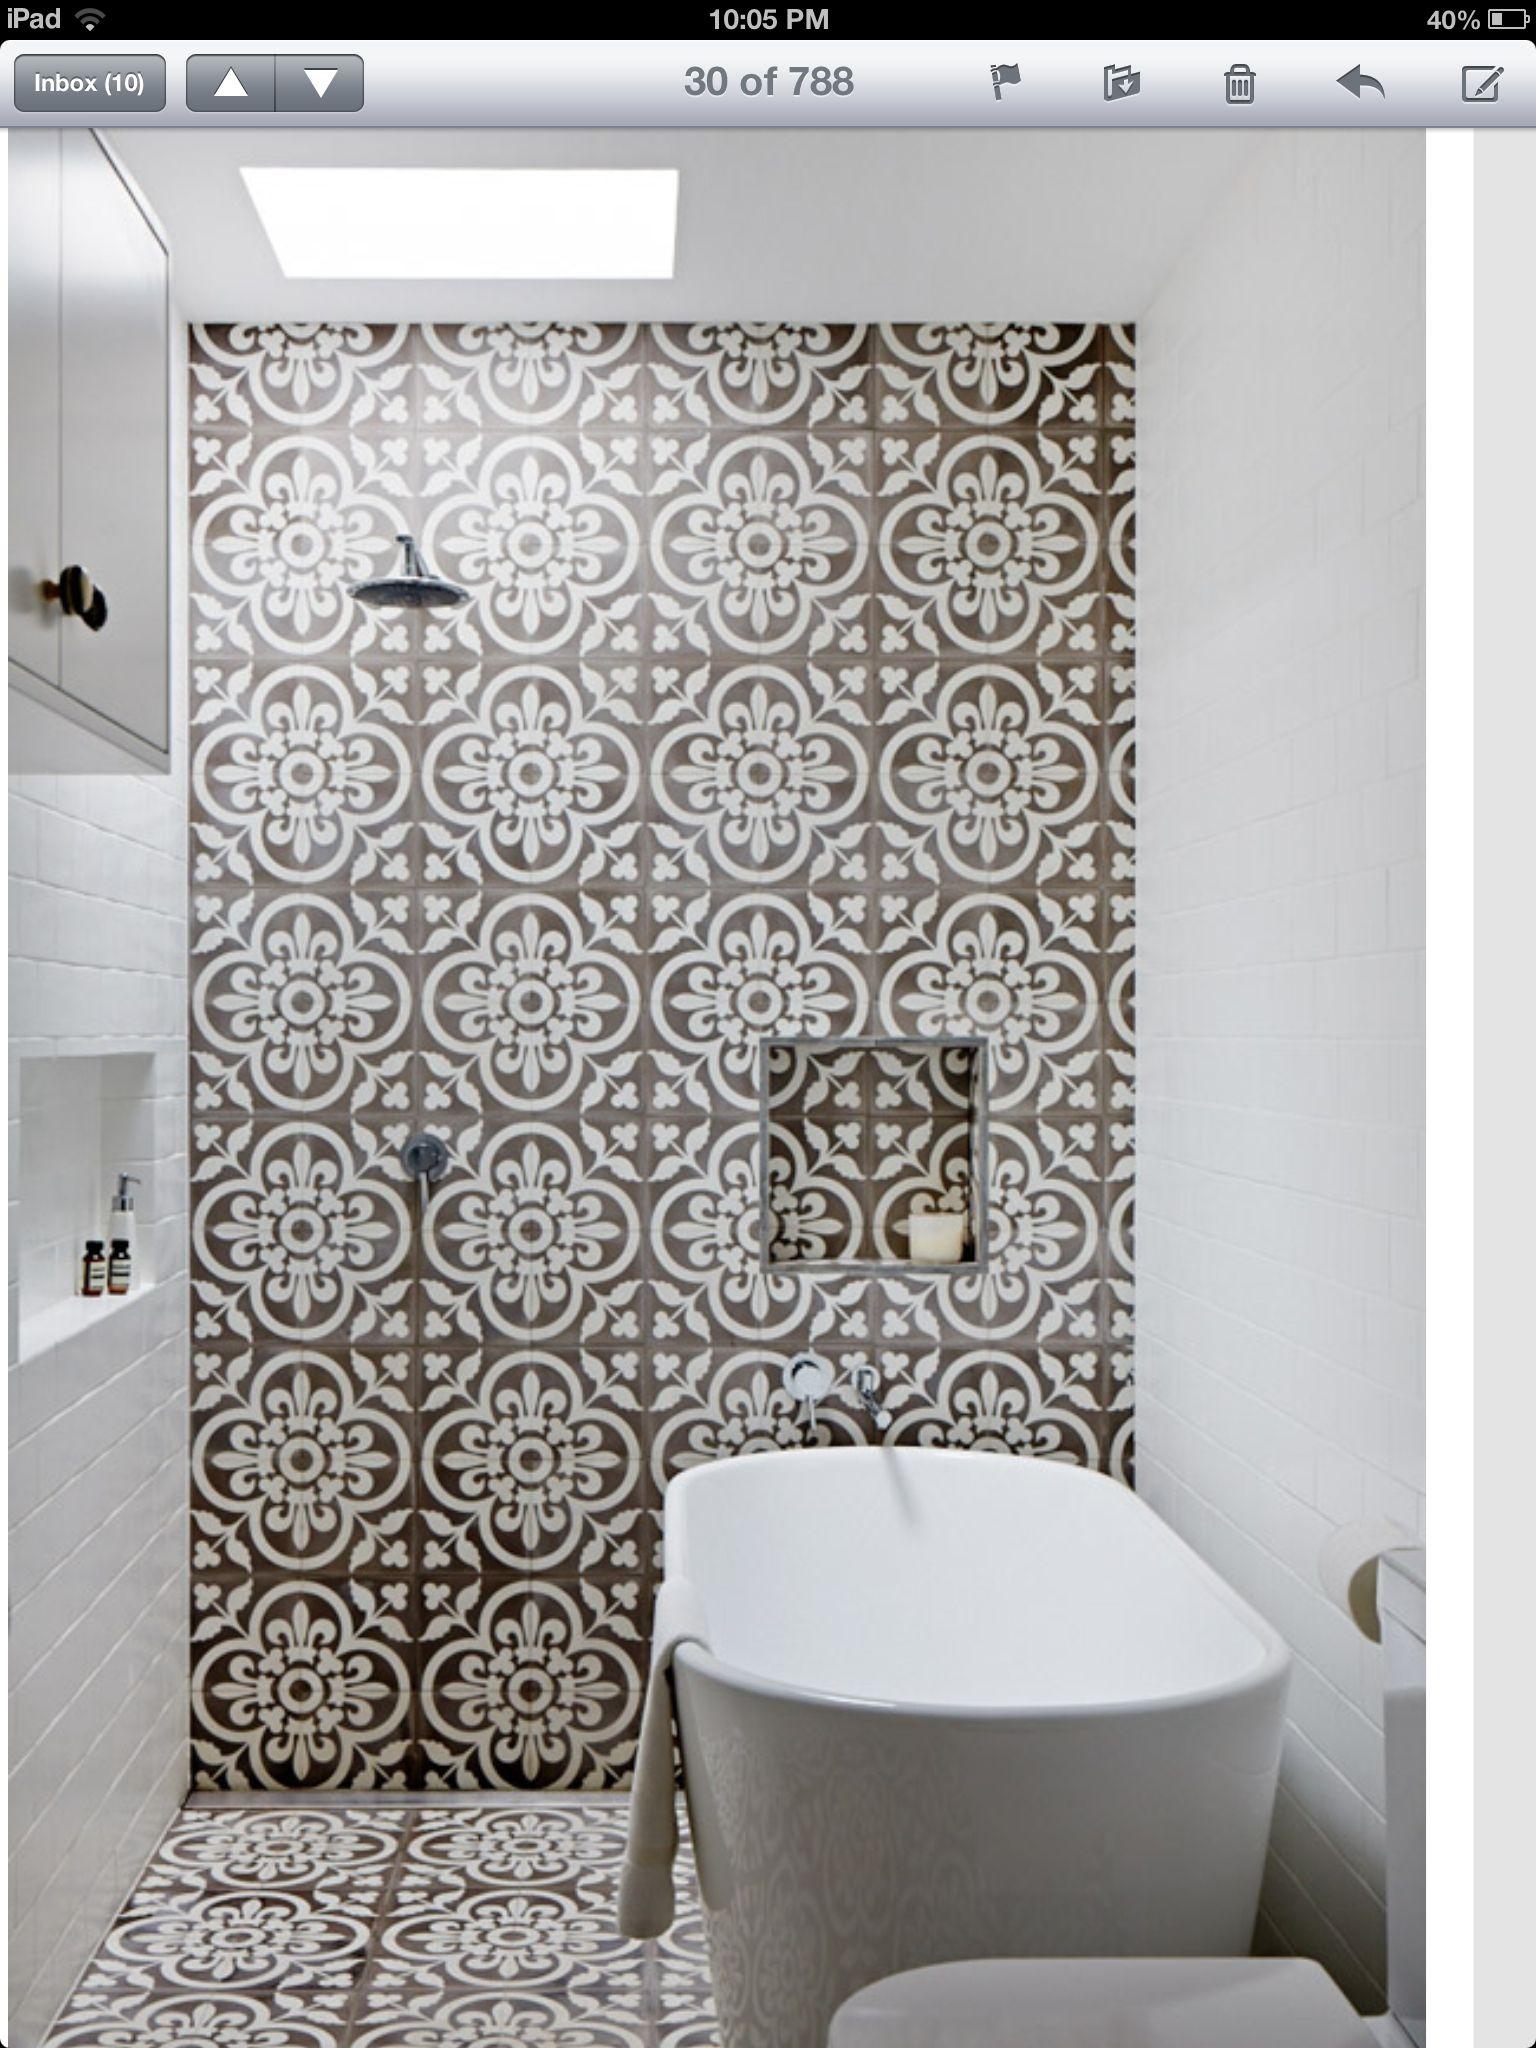 Geometric Tiles Geometric Tiles In 2019 Moroccan throughout sizing 1536 X 2048